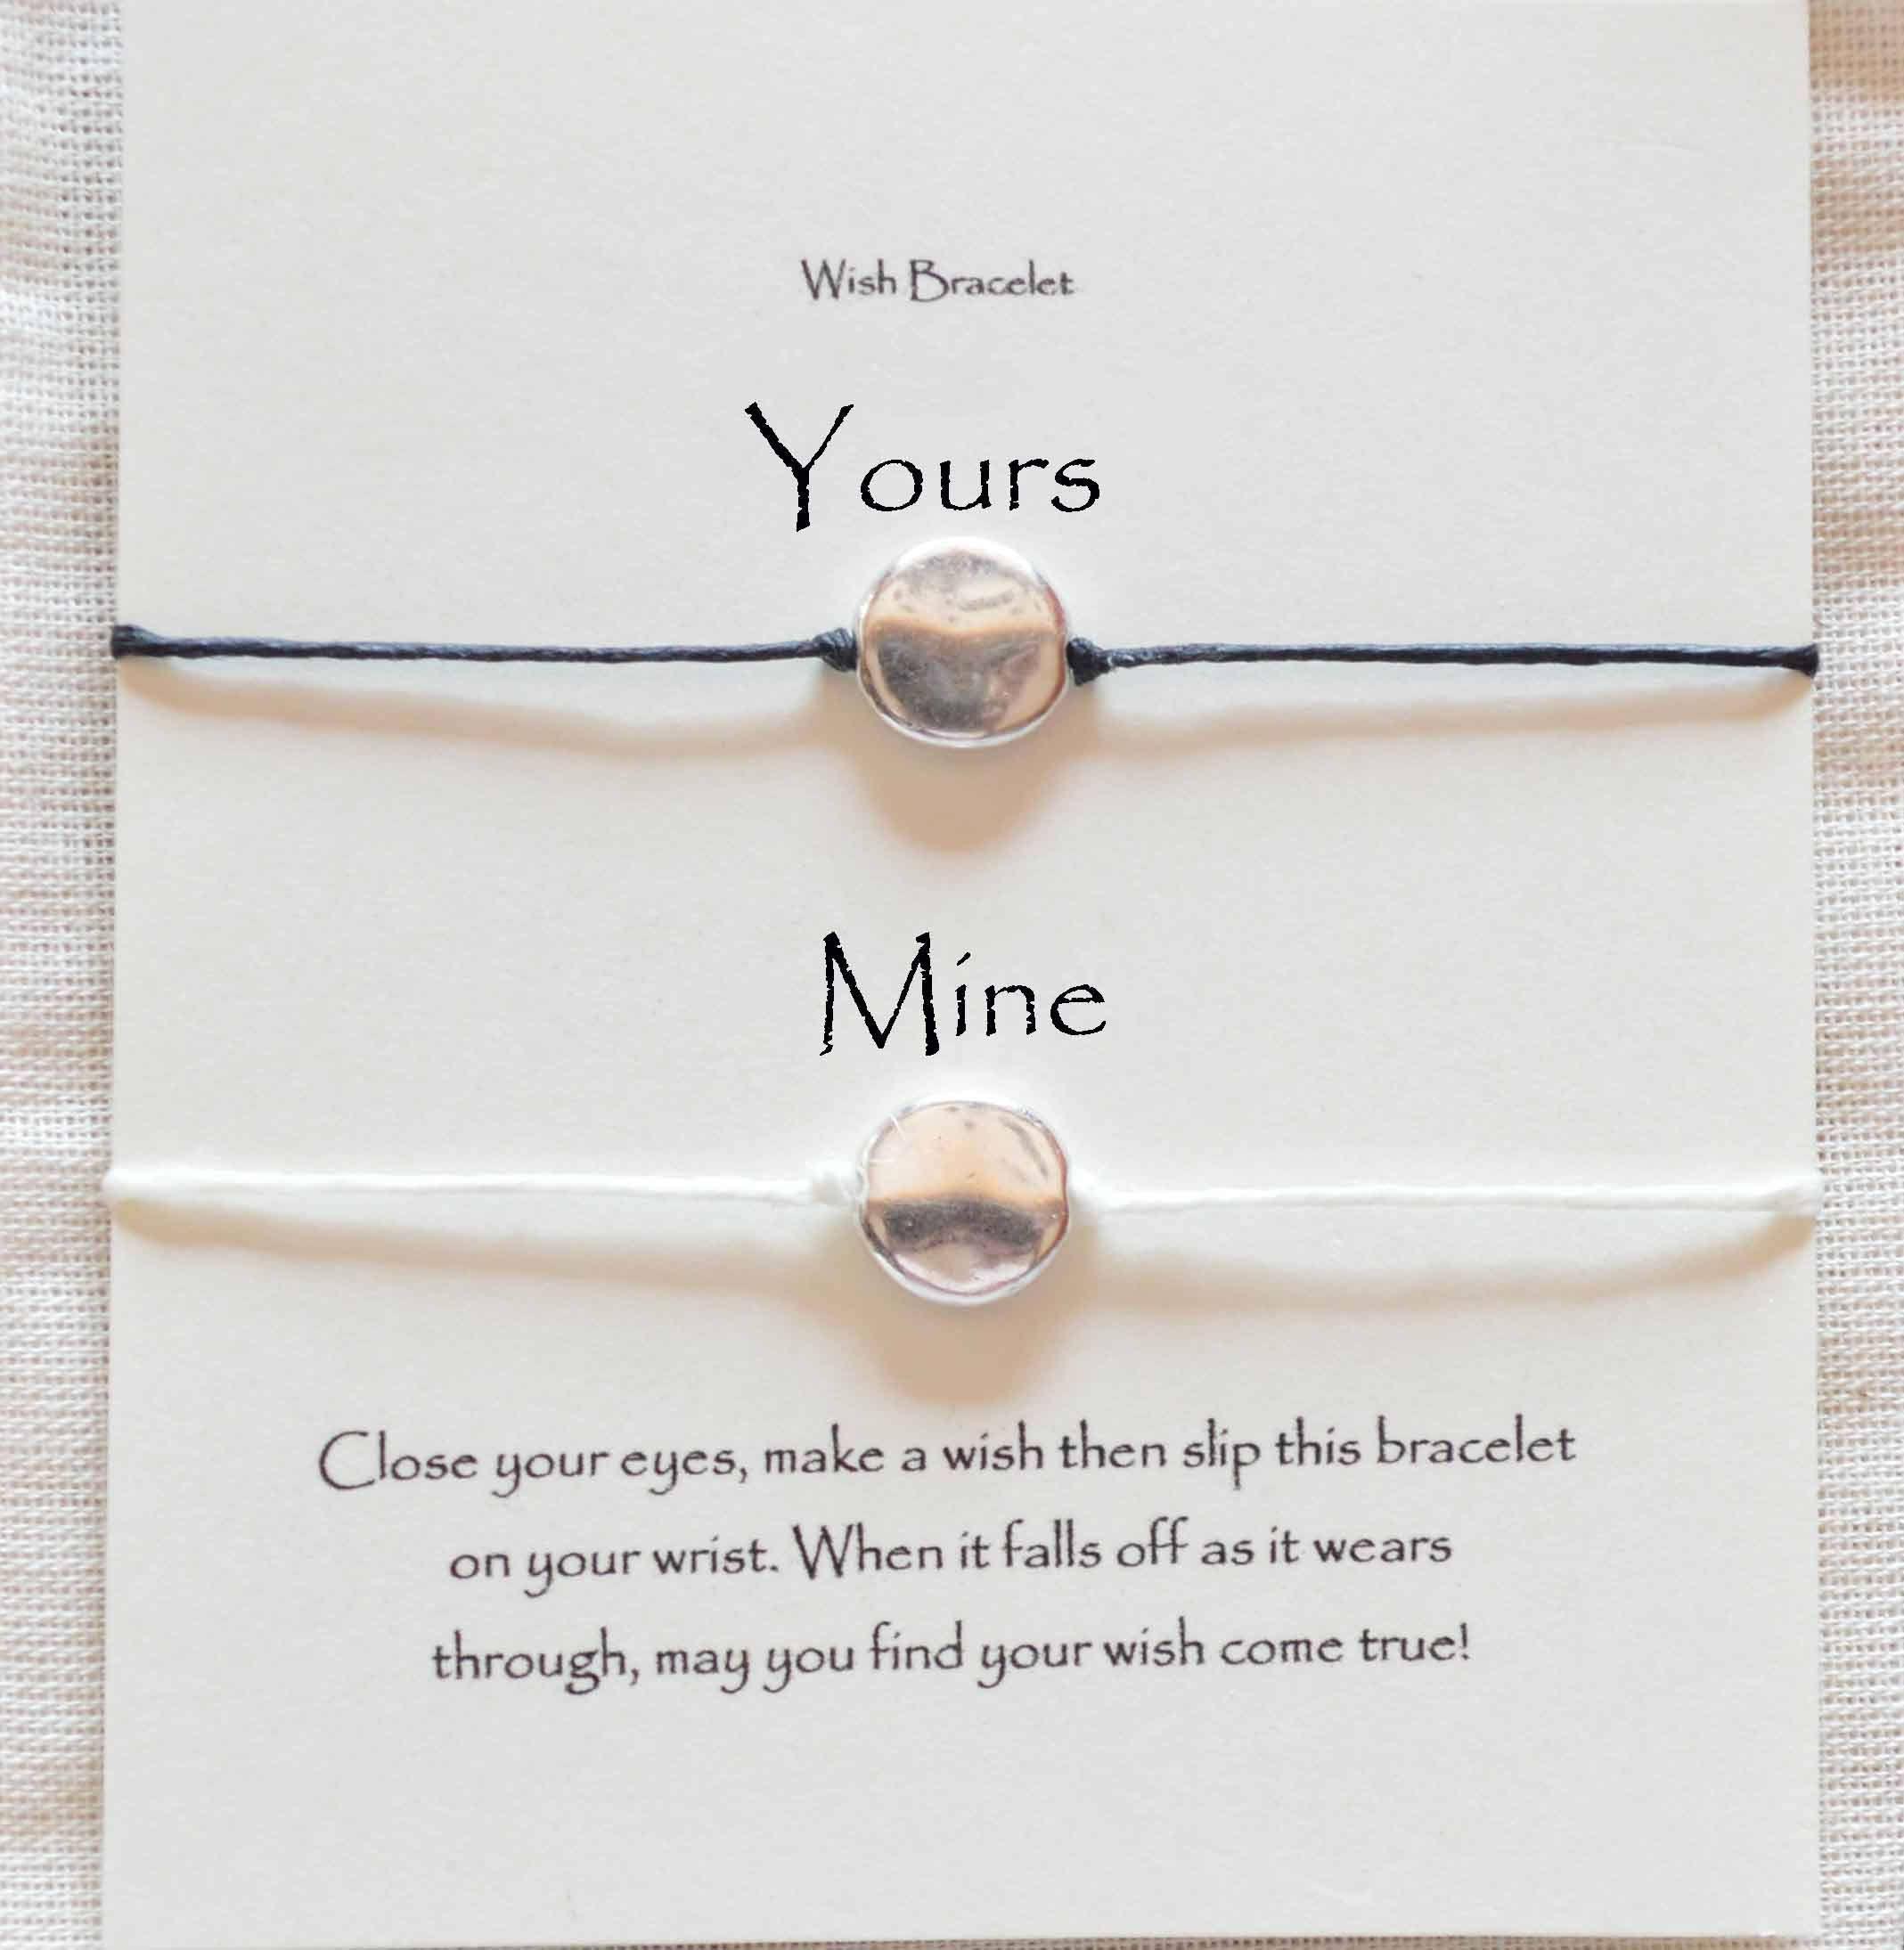 His Hers Bracelets Couples Bracelets Couples Matching Etsy Relationship Bracelets Wish Bracelets Girlfriend Gifts